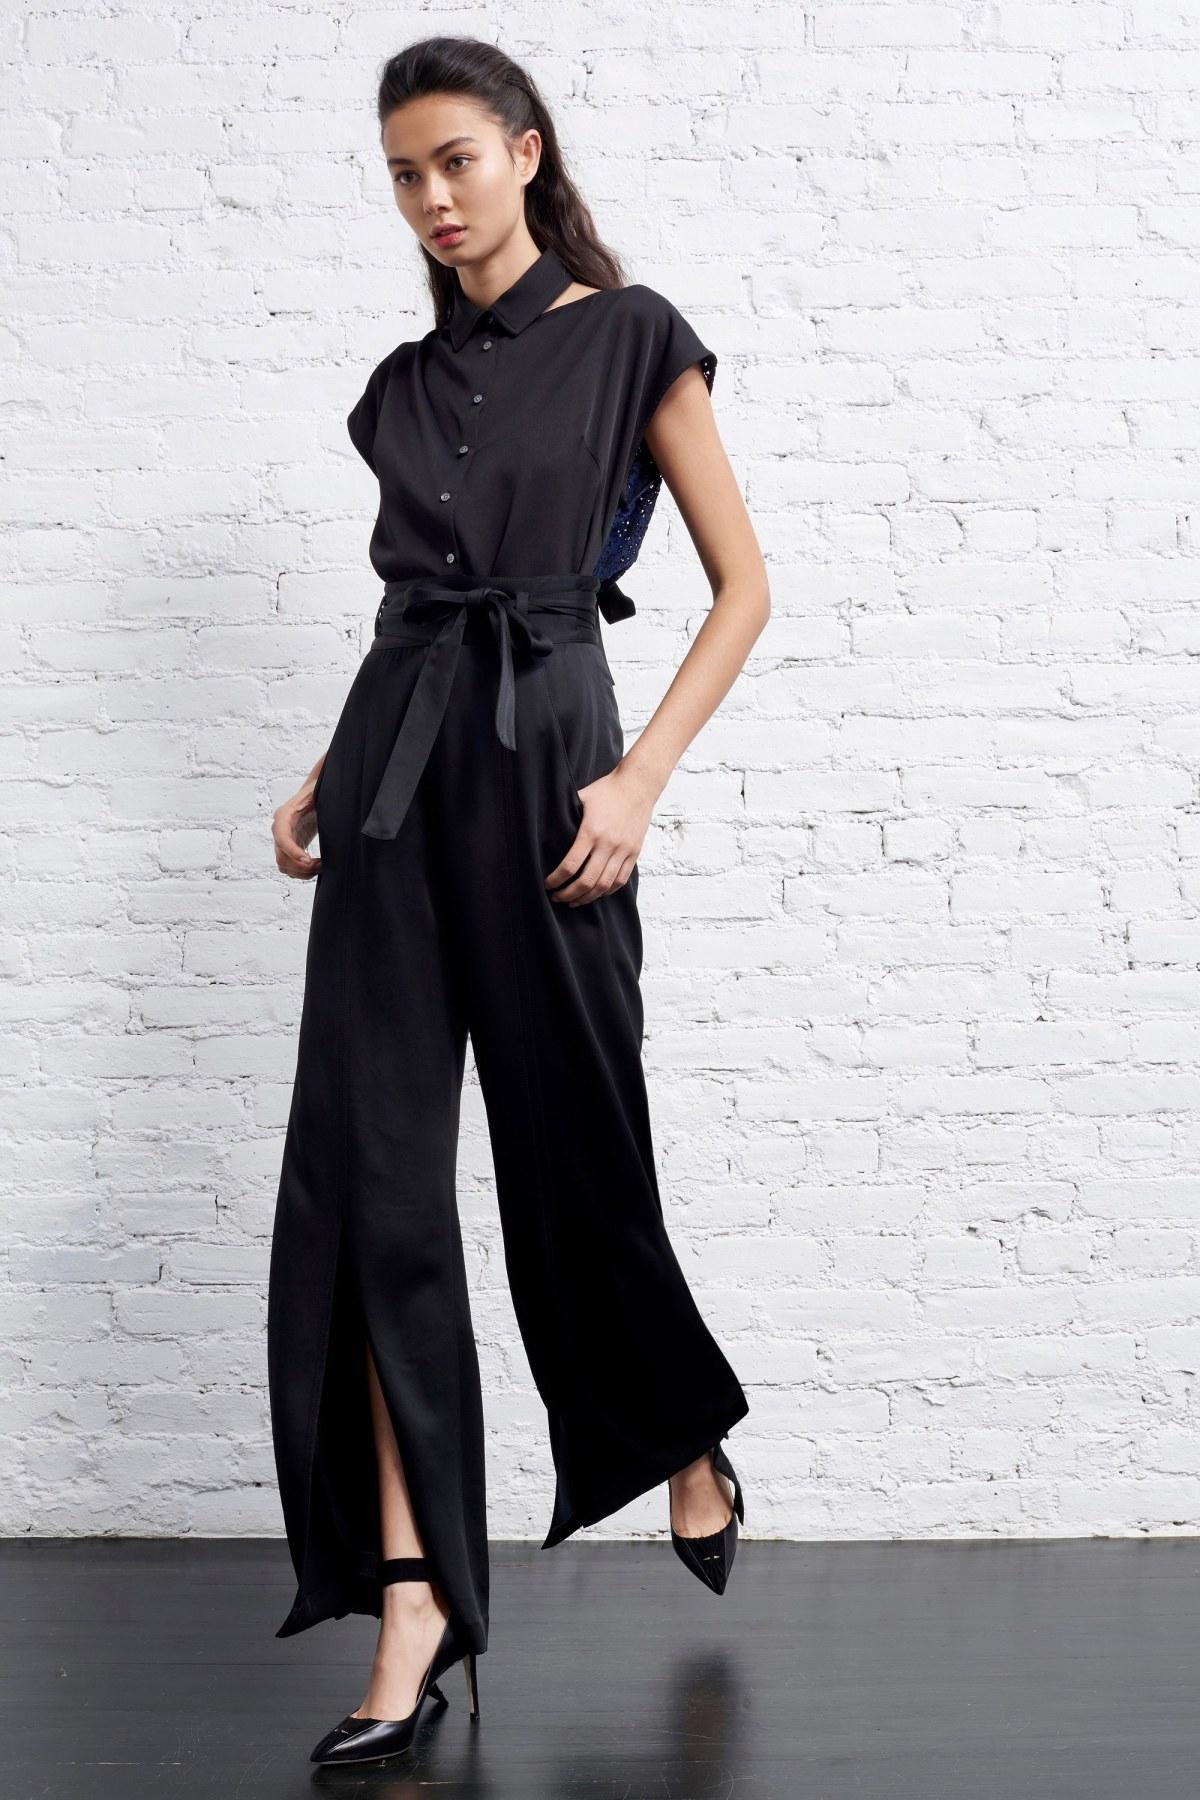 marissa-webb-pre-fall-2017-fashion-show-the-impression-12